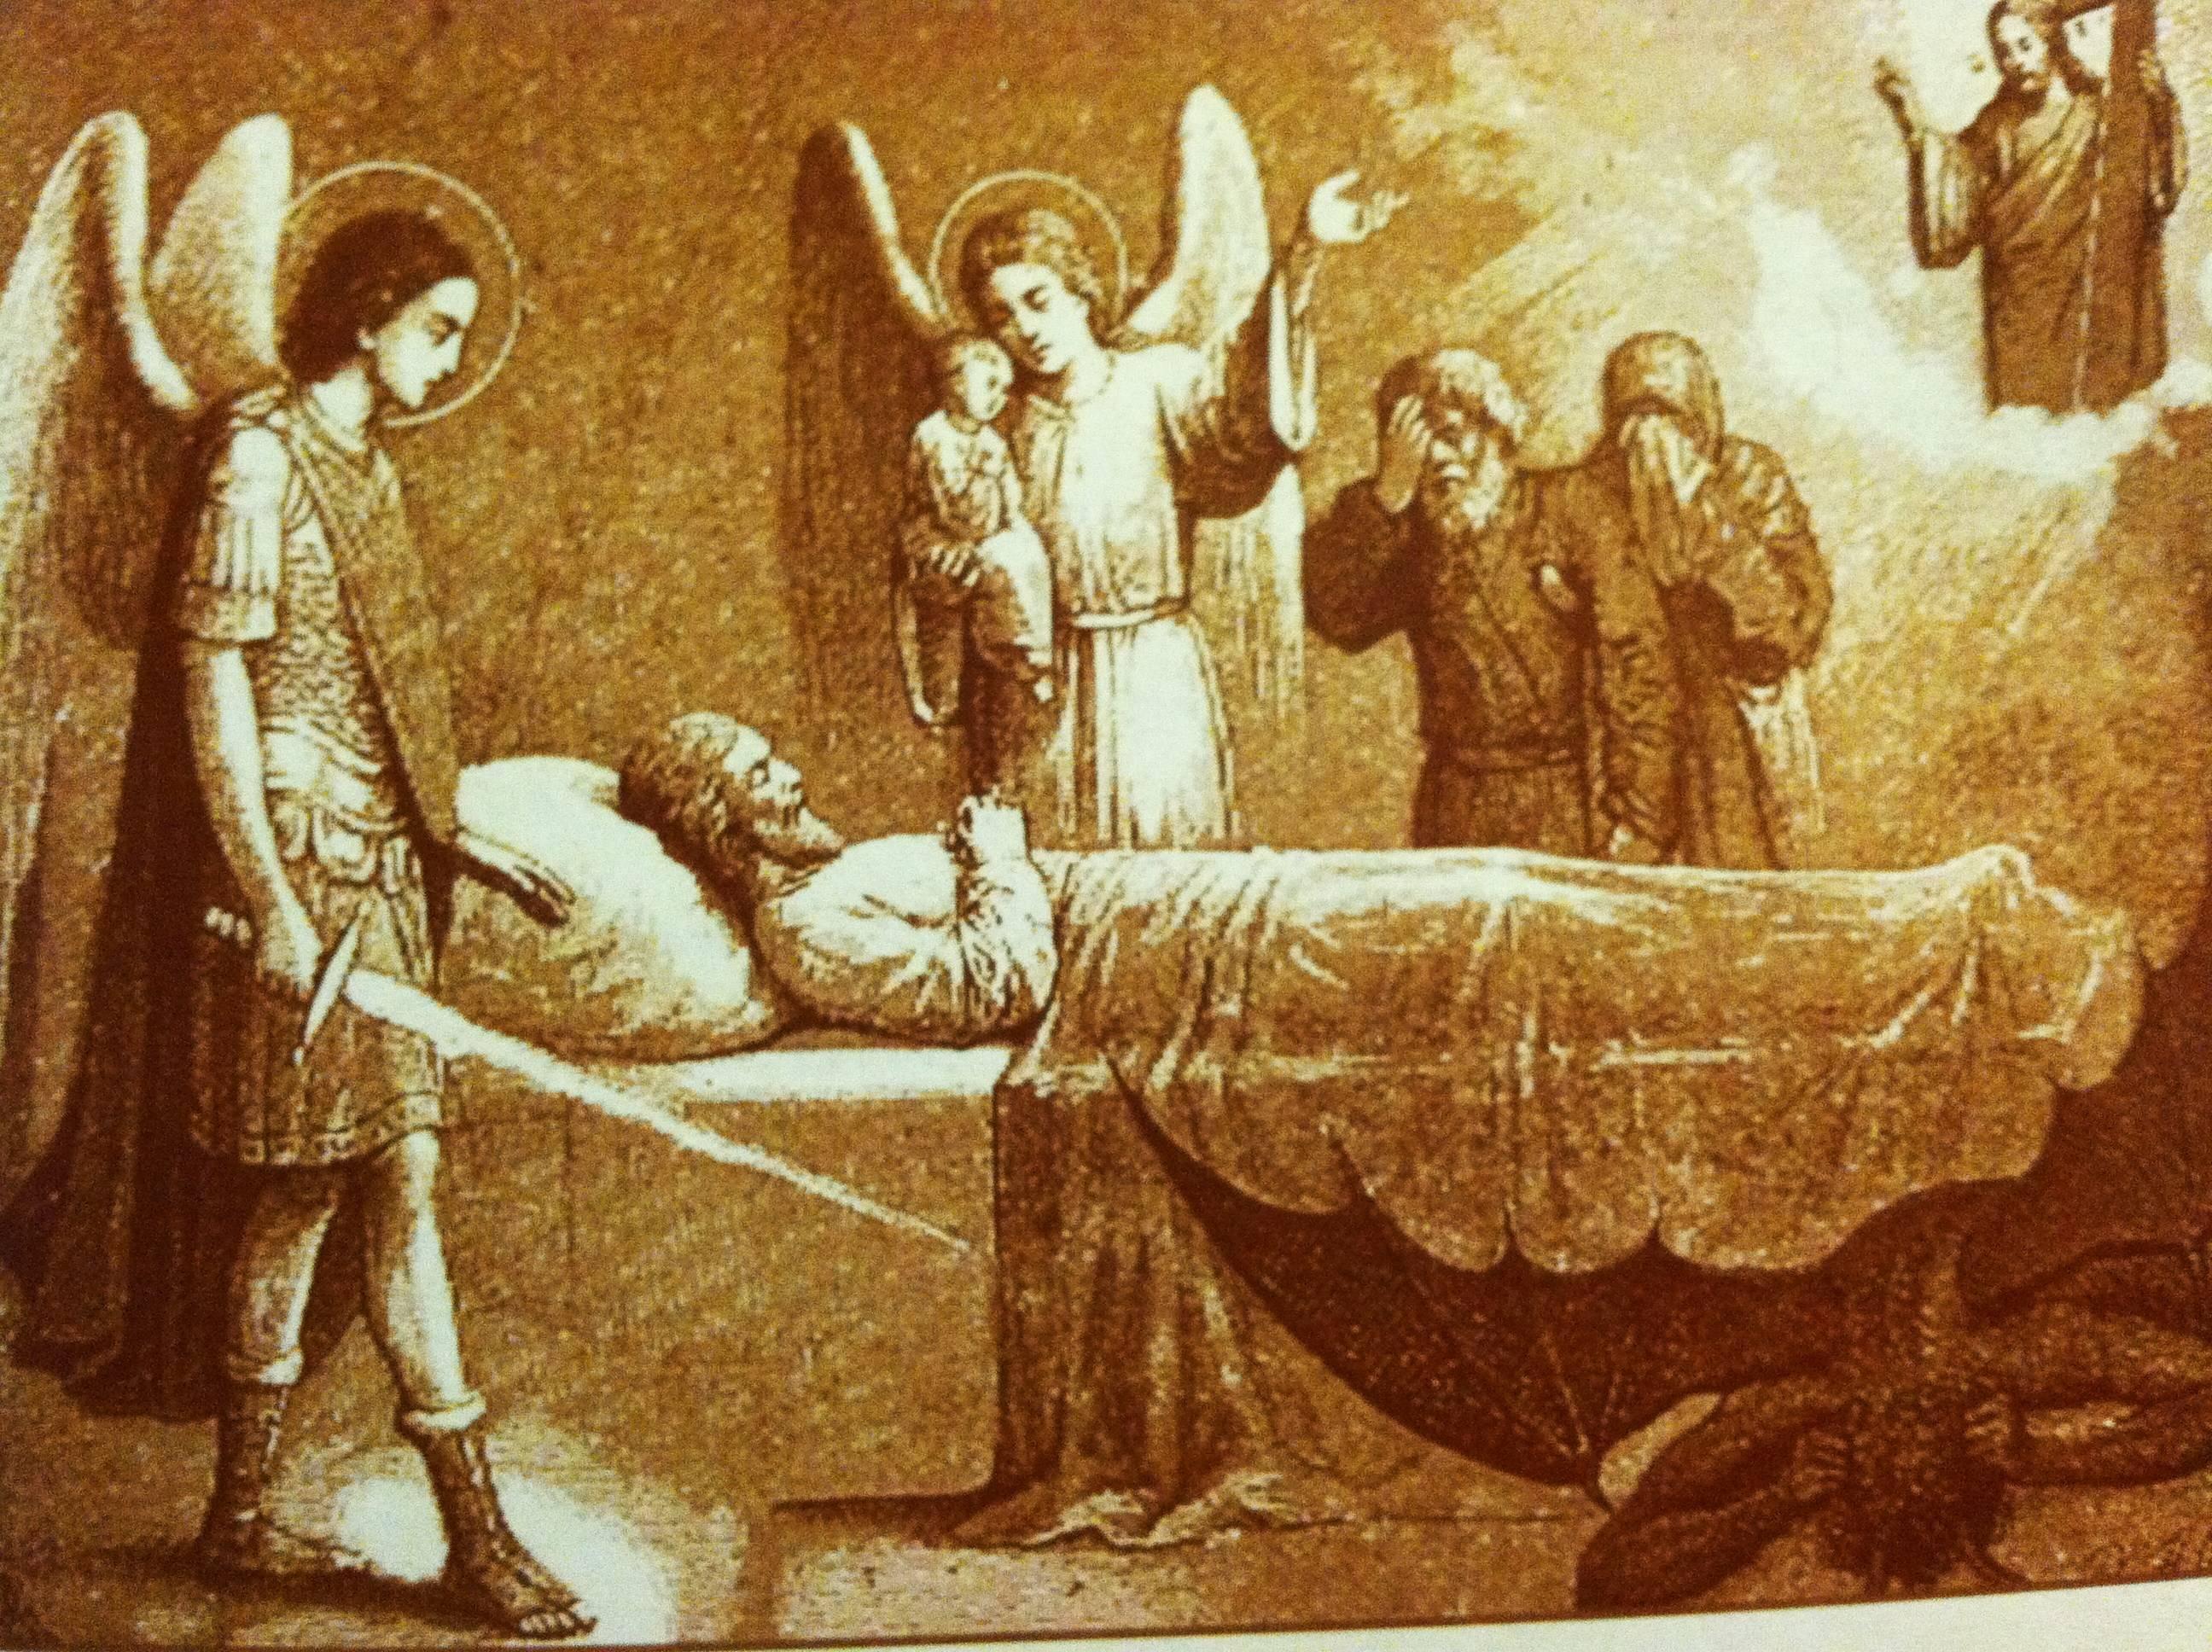 Куда попадает душа после смерти: что происходит с умершим